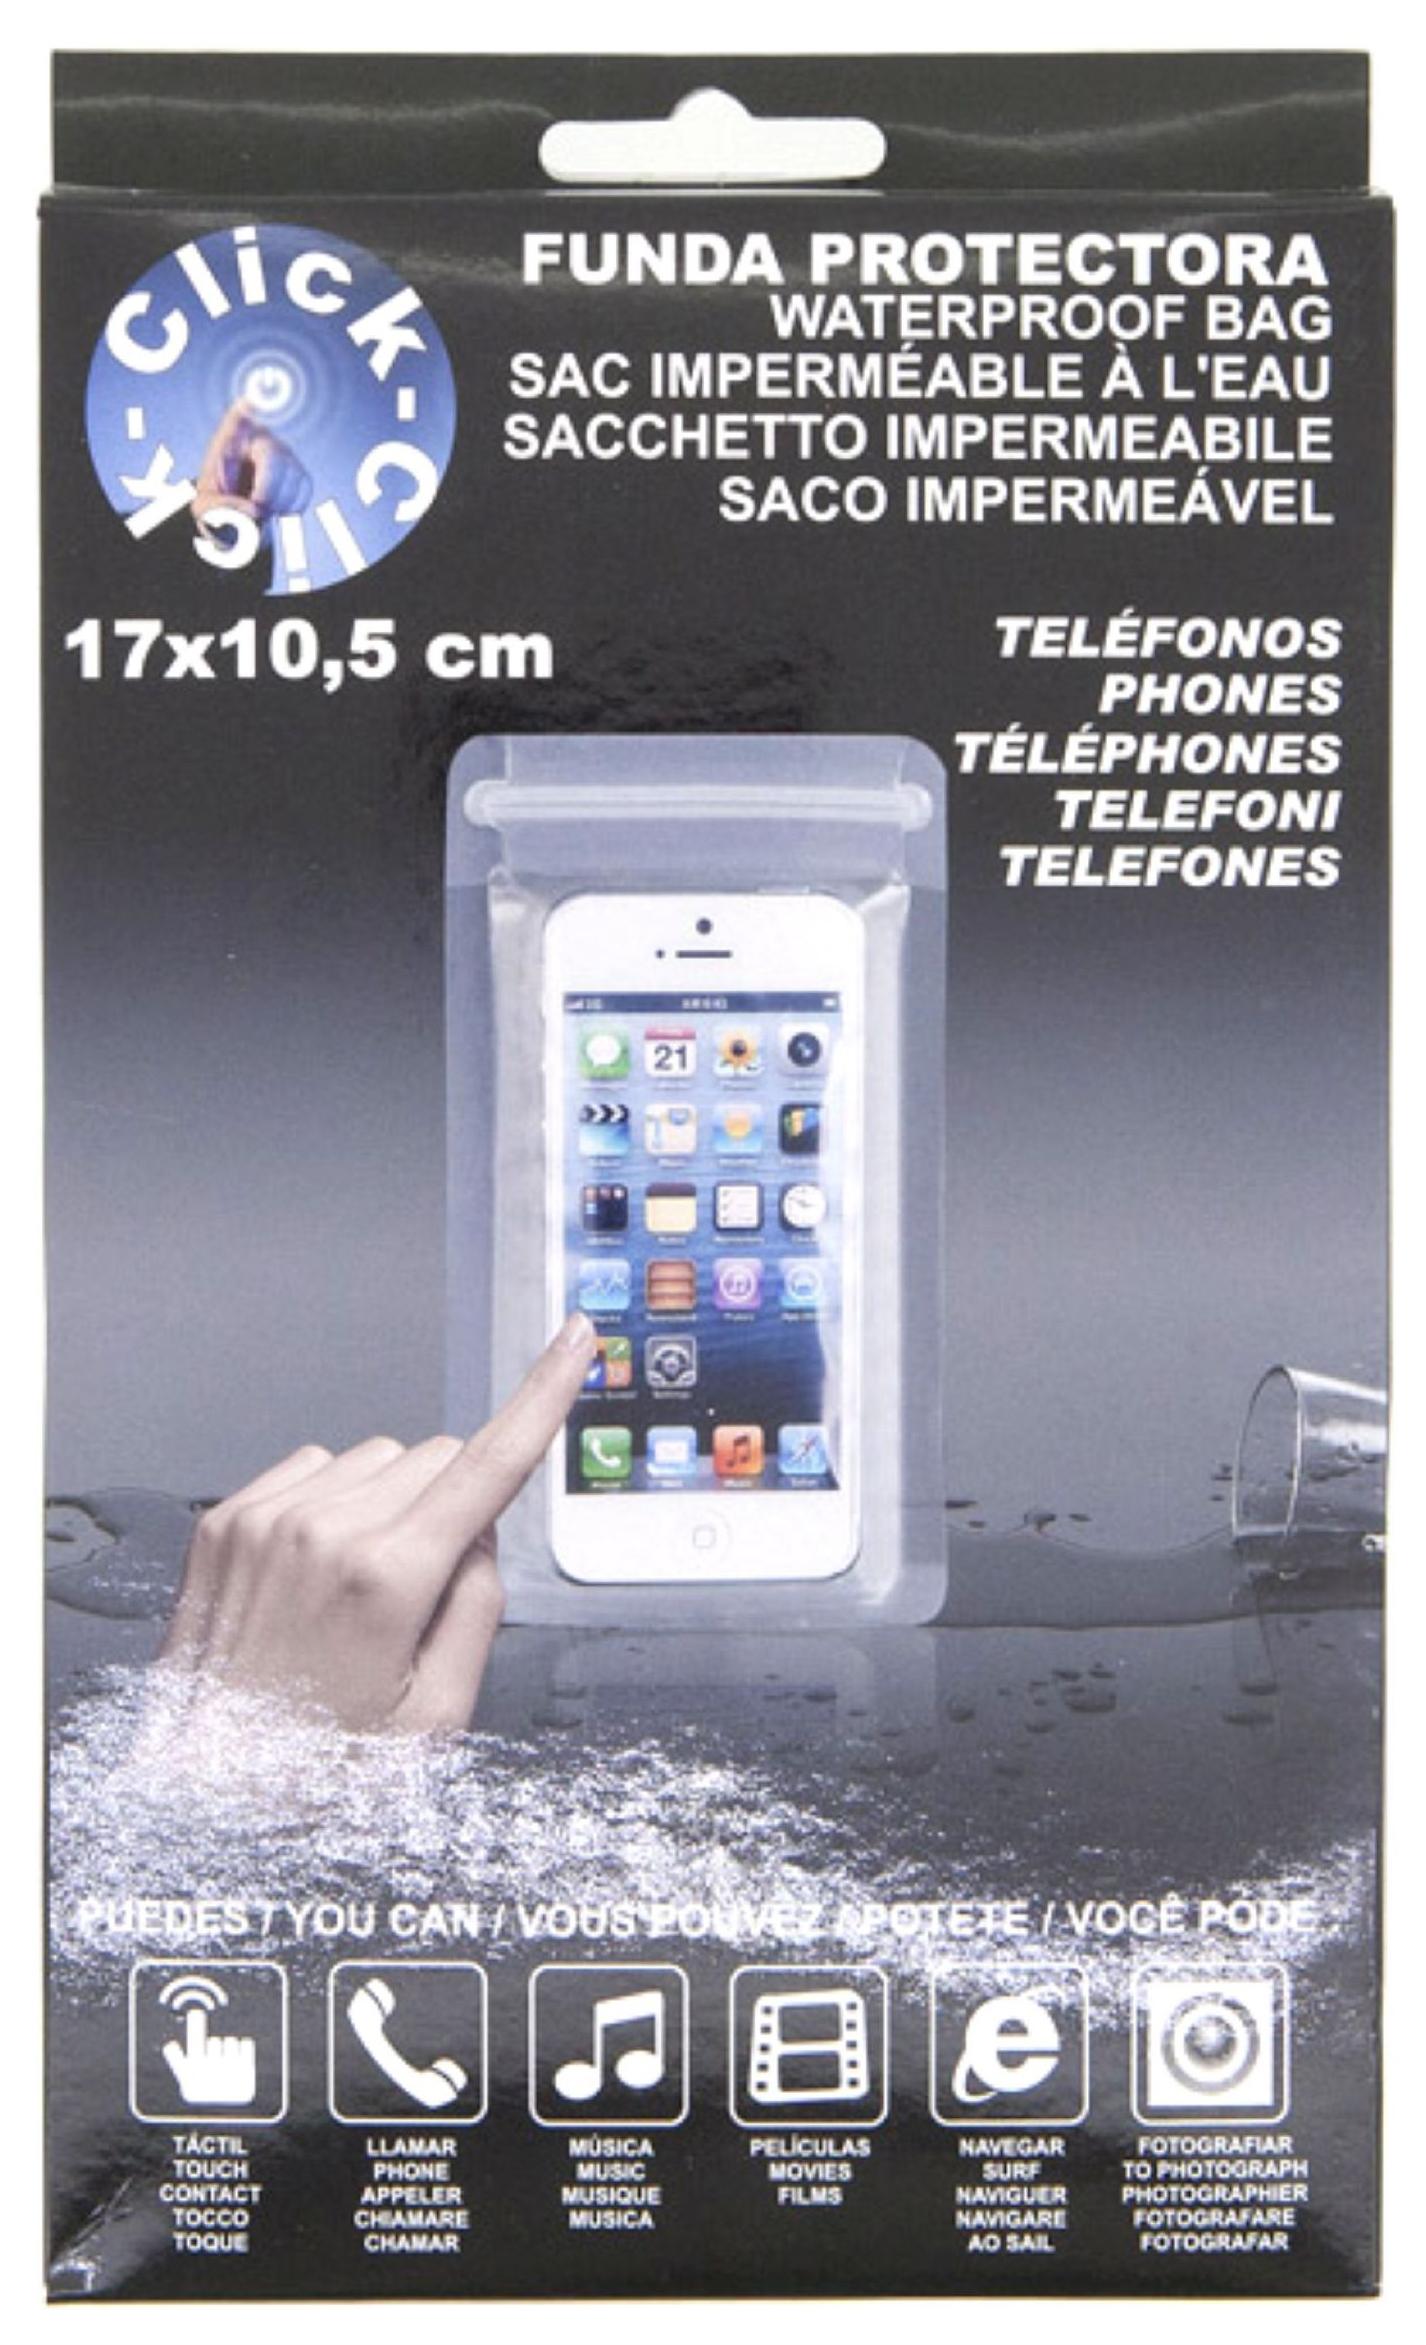 FUNDA PROTECTORA TELEFONO 17X10.5 CM